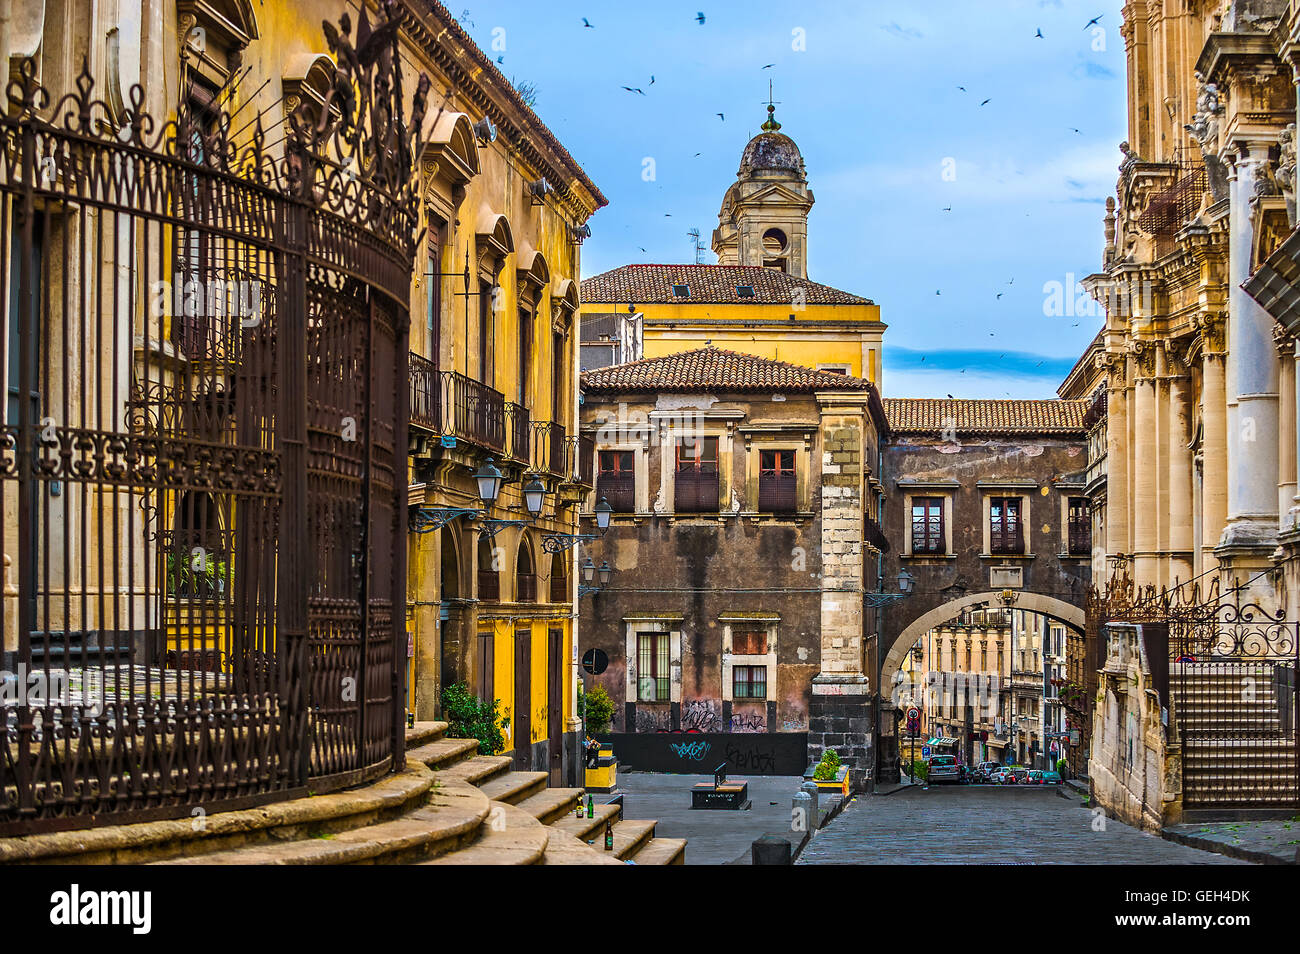 Italy Sicily Catania Via Crociferi - Triumphal arch of San Benedetto - Stock Image